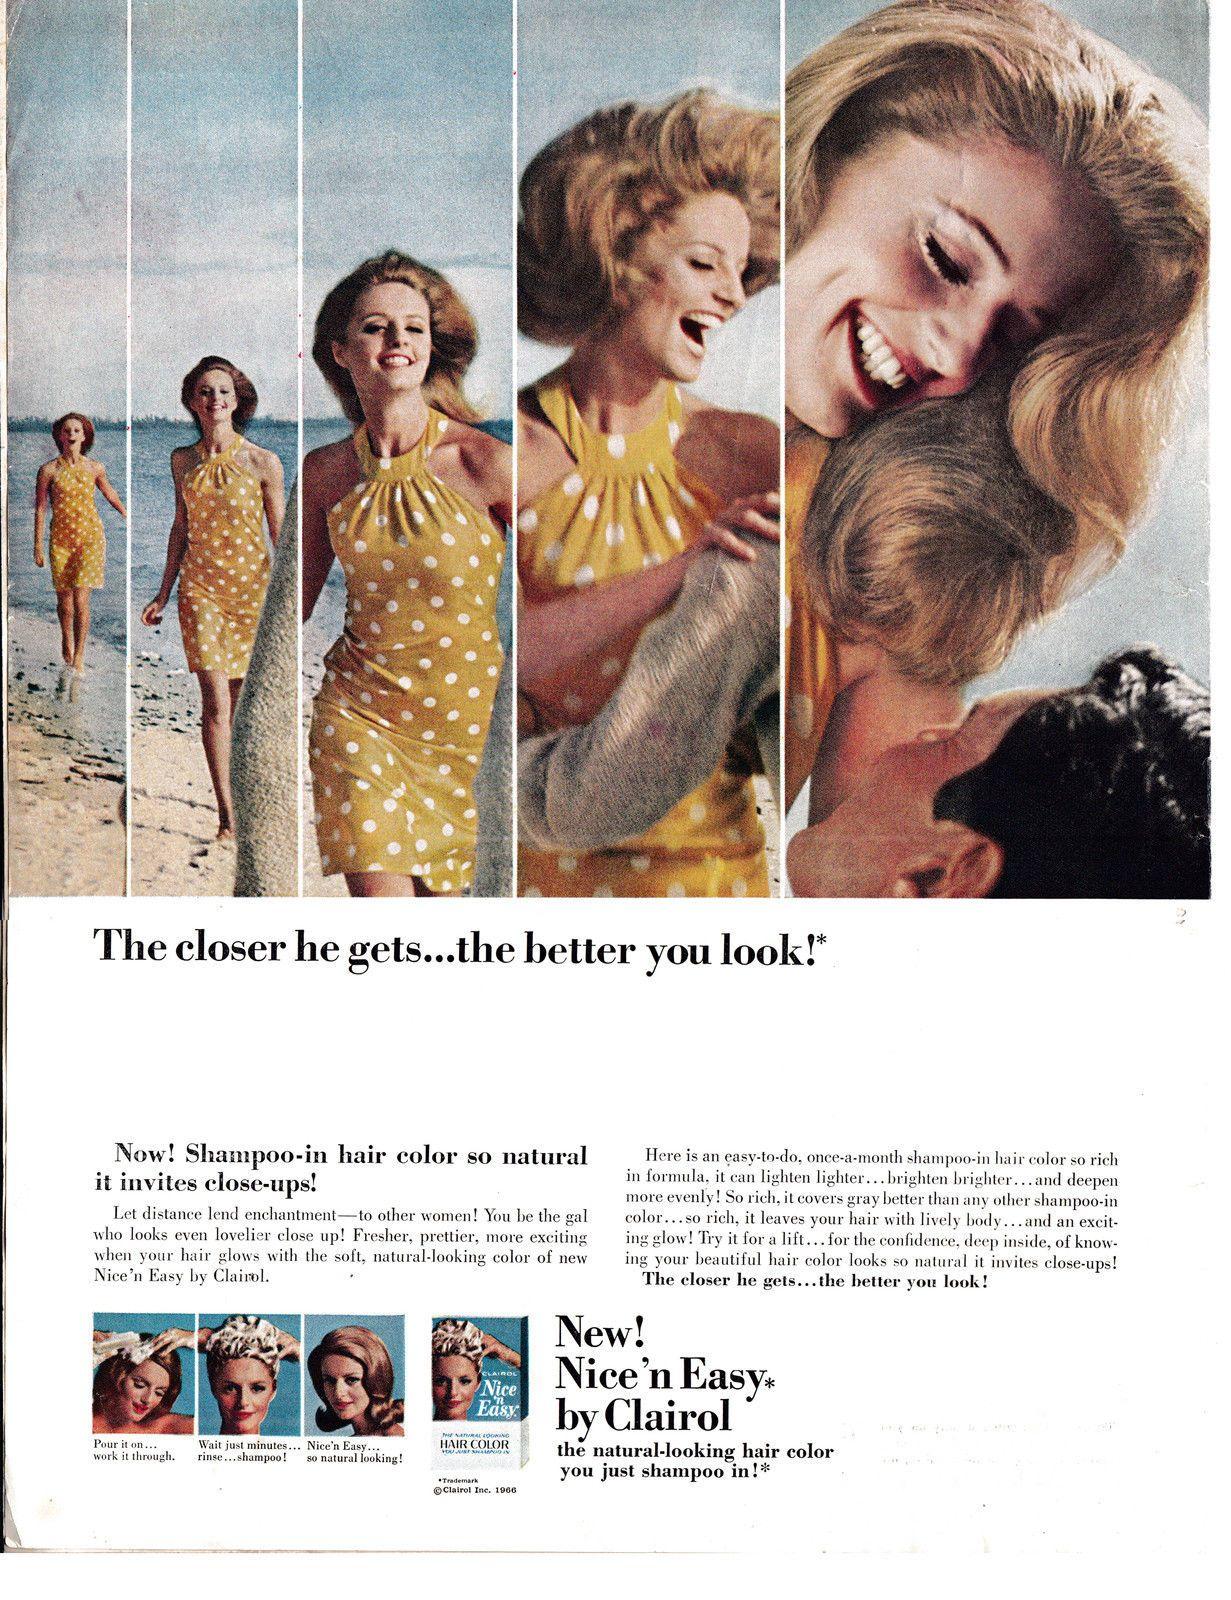 1966 Clairol Nice N Easy Shampoo Hair Coloring Original 13 5 10 5 Magazine Ad Clairol Hair Shampoo Hair Color Shampoo